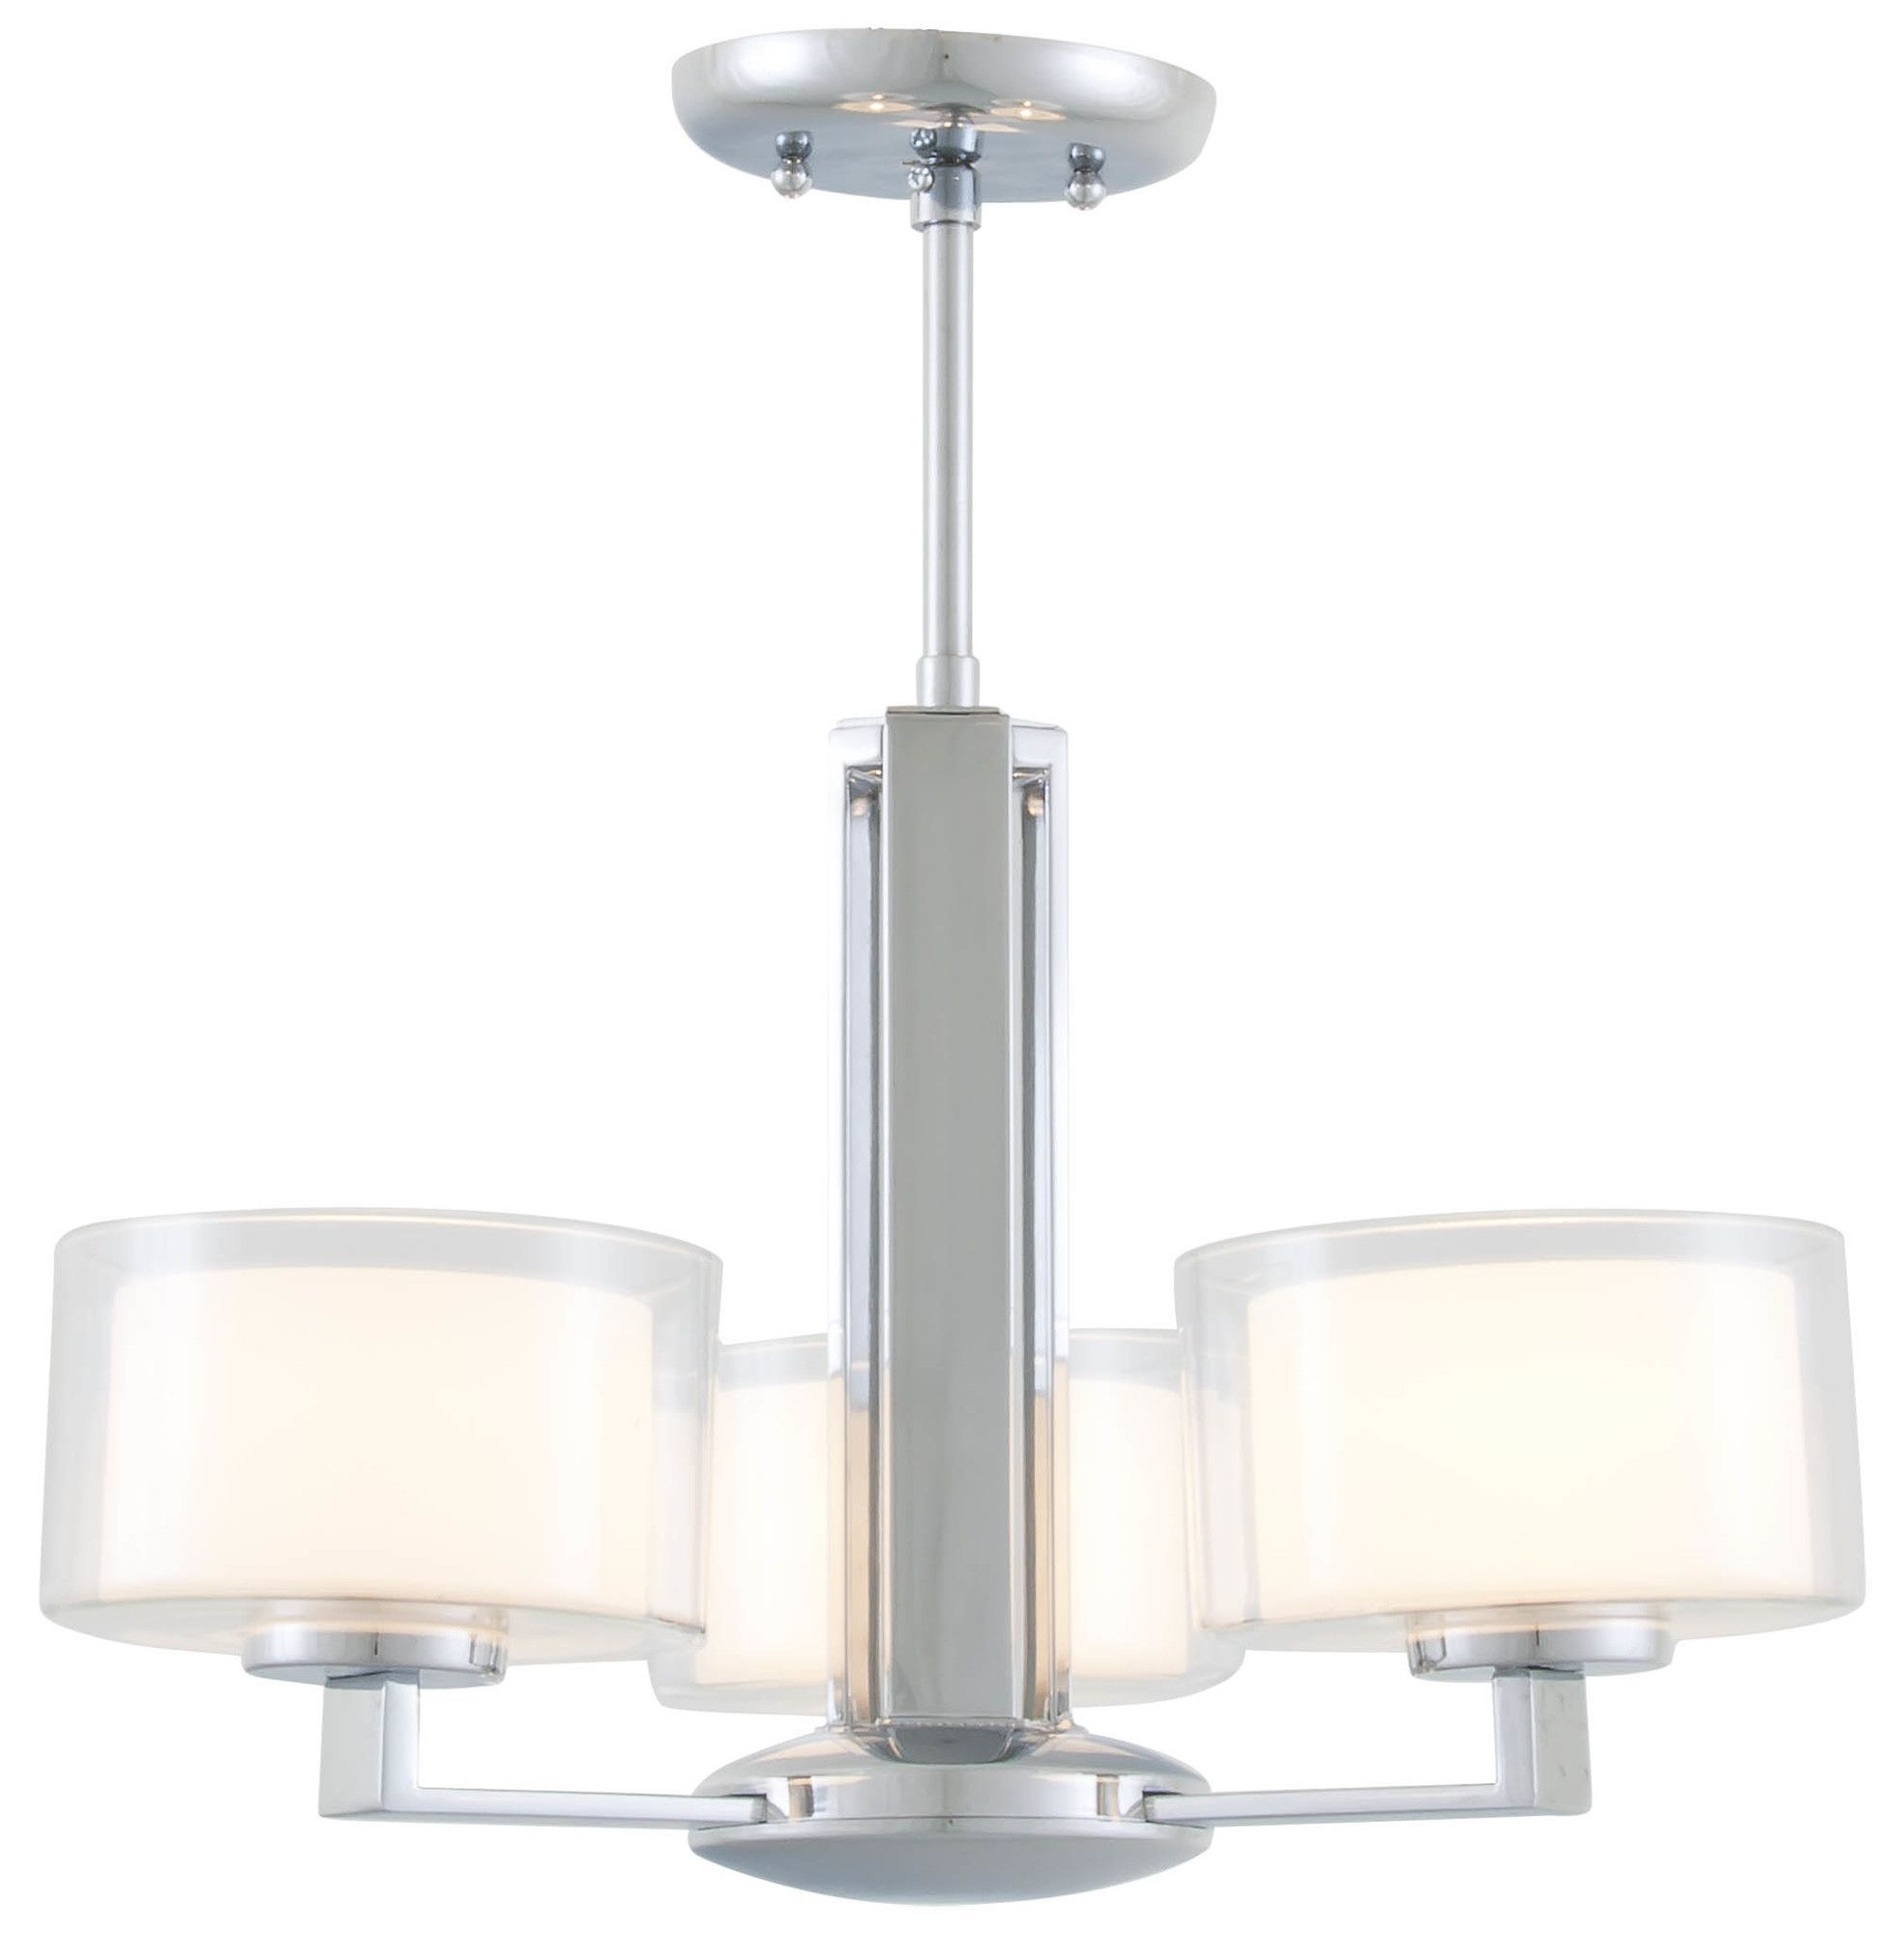 Lustres concevoir gratuit design moderne dvi princeton light chandelier shop allmodern 3 light